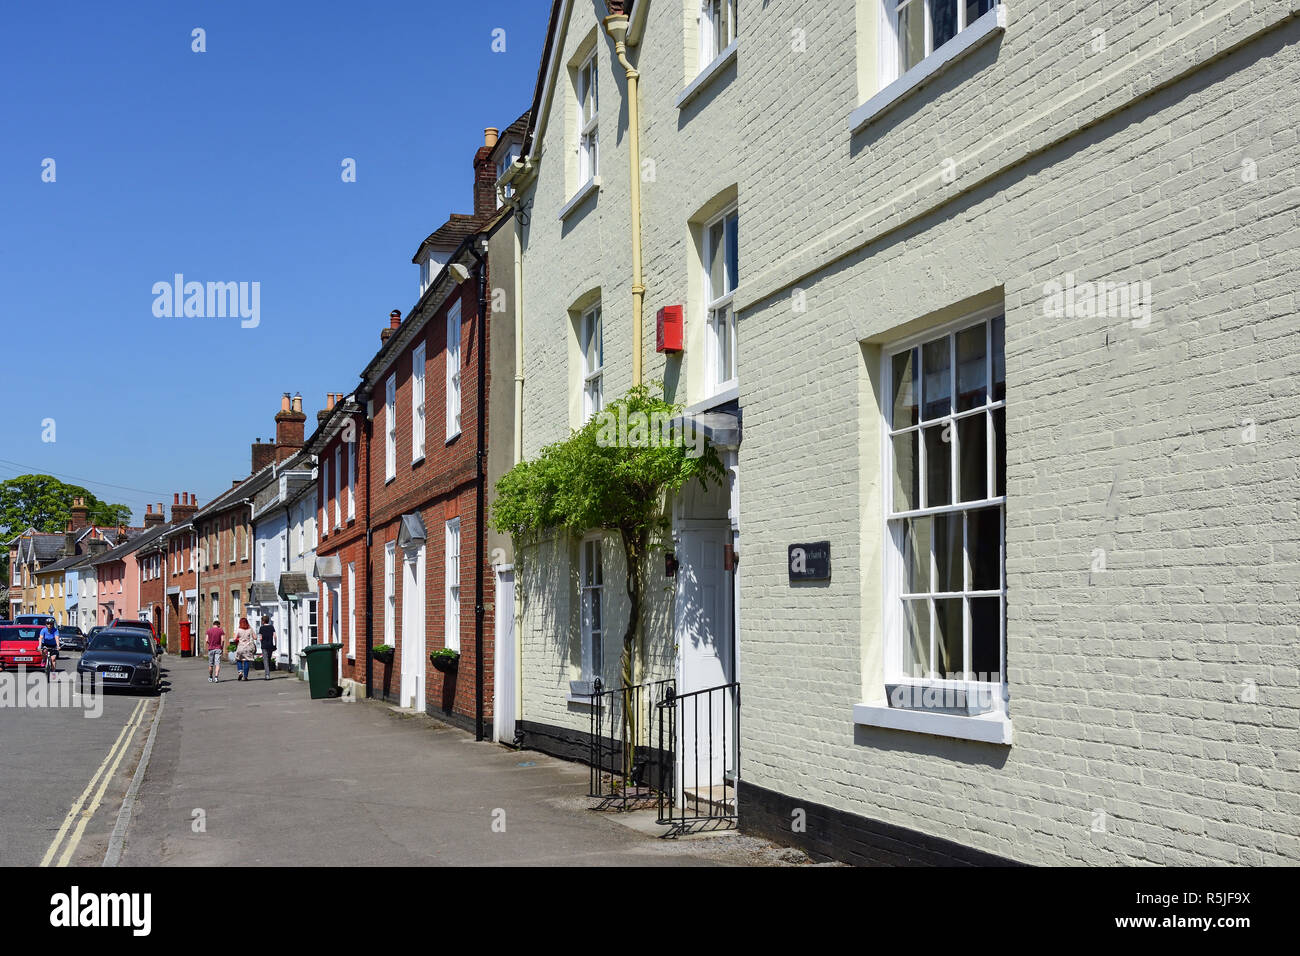 Period houses, West Borough, Wimborne Minster, Dorset, England, United Kingdom Stock Photo